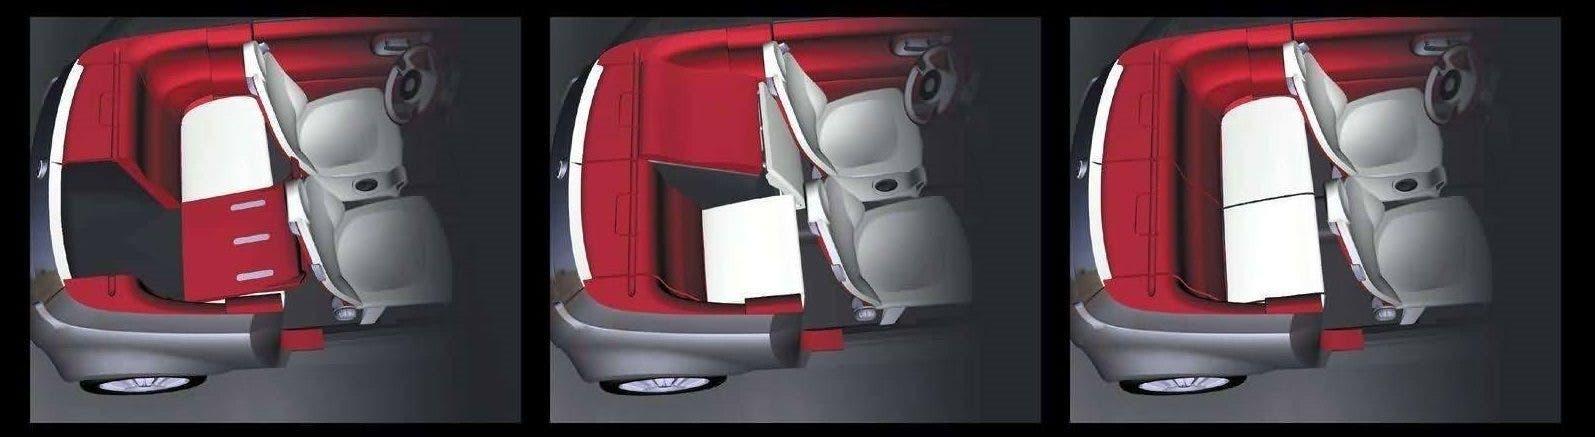 Fiat-Trepiuno_Concept-2004-1600-09